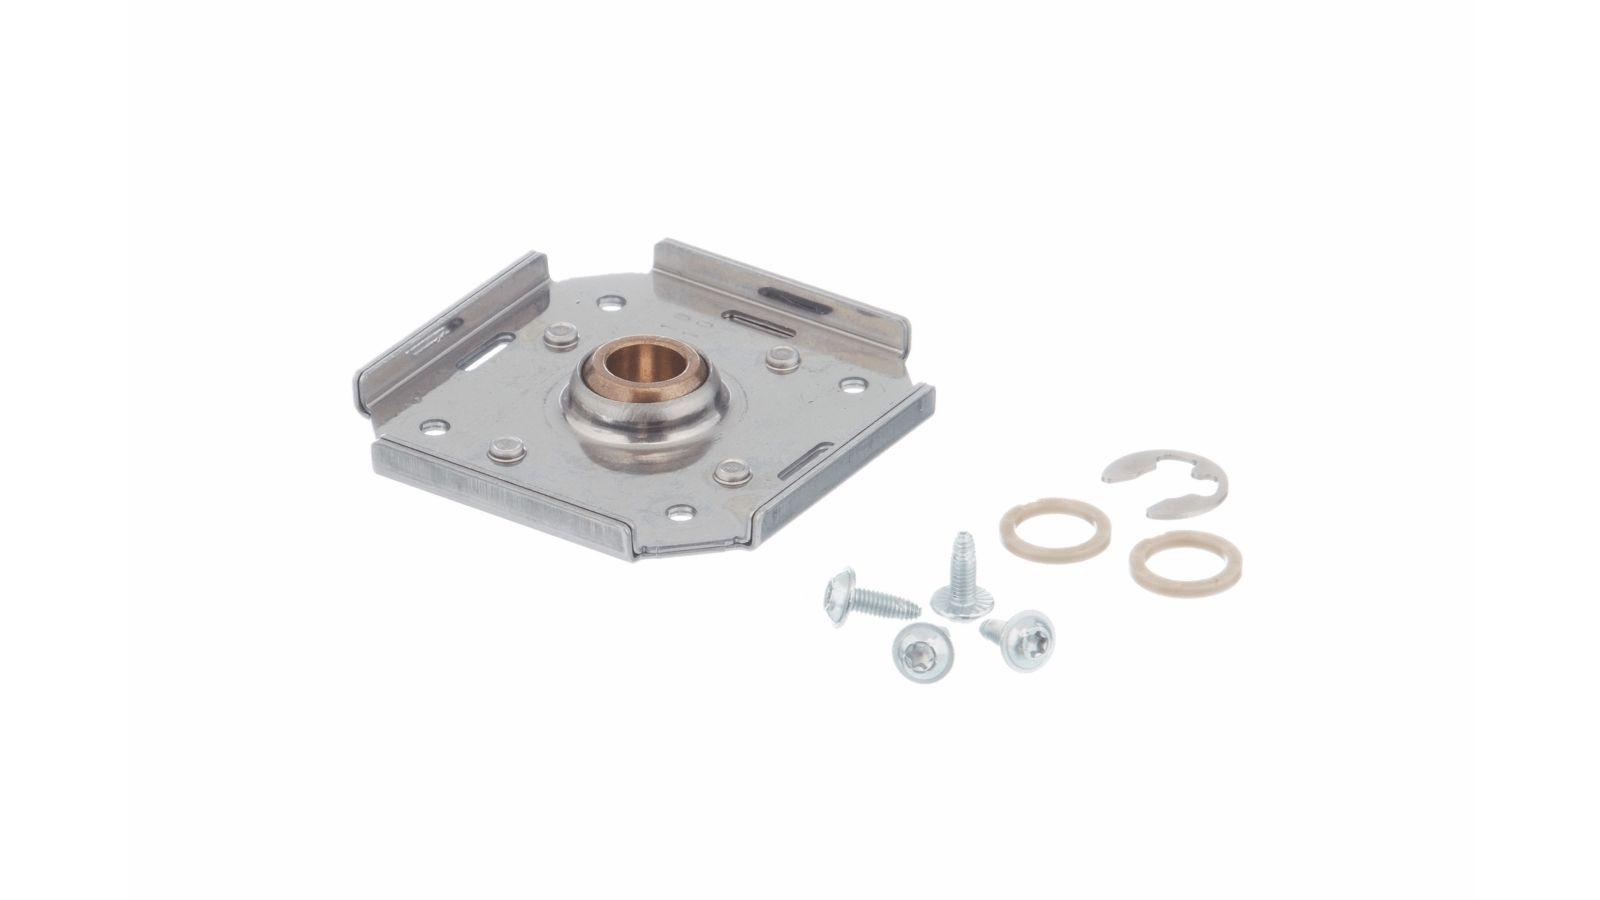 Drum Bearing for Bosch Tumble Dryers - 00618931 BSH - Bosch / Siemens